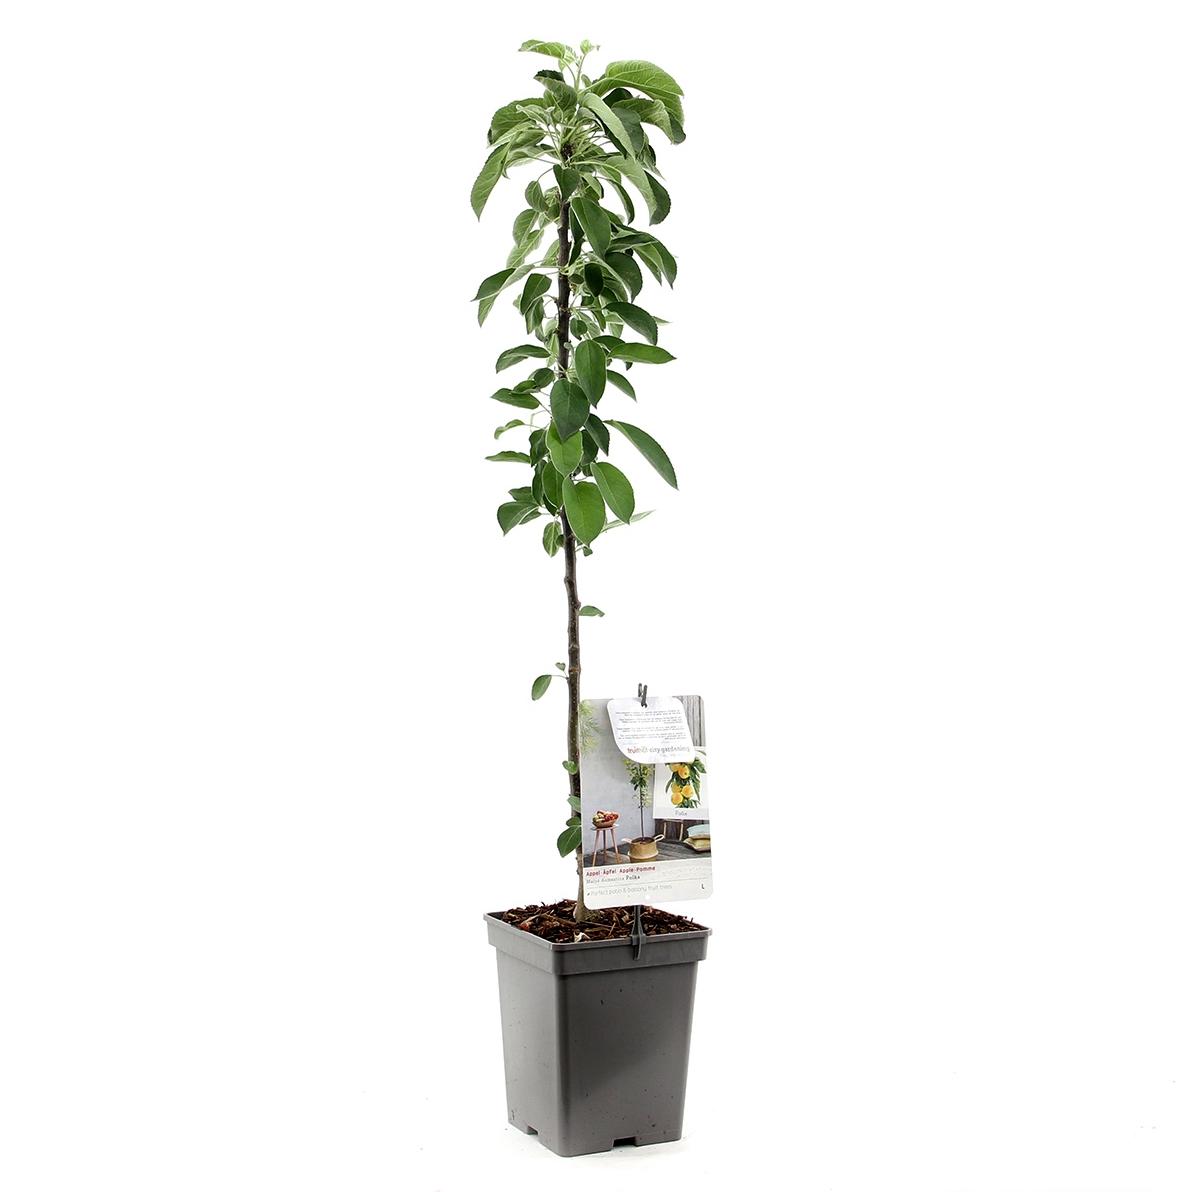 Zuil-appelboom Malus domestica 'Polka'